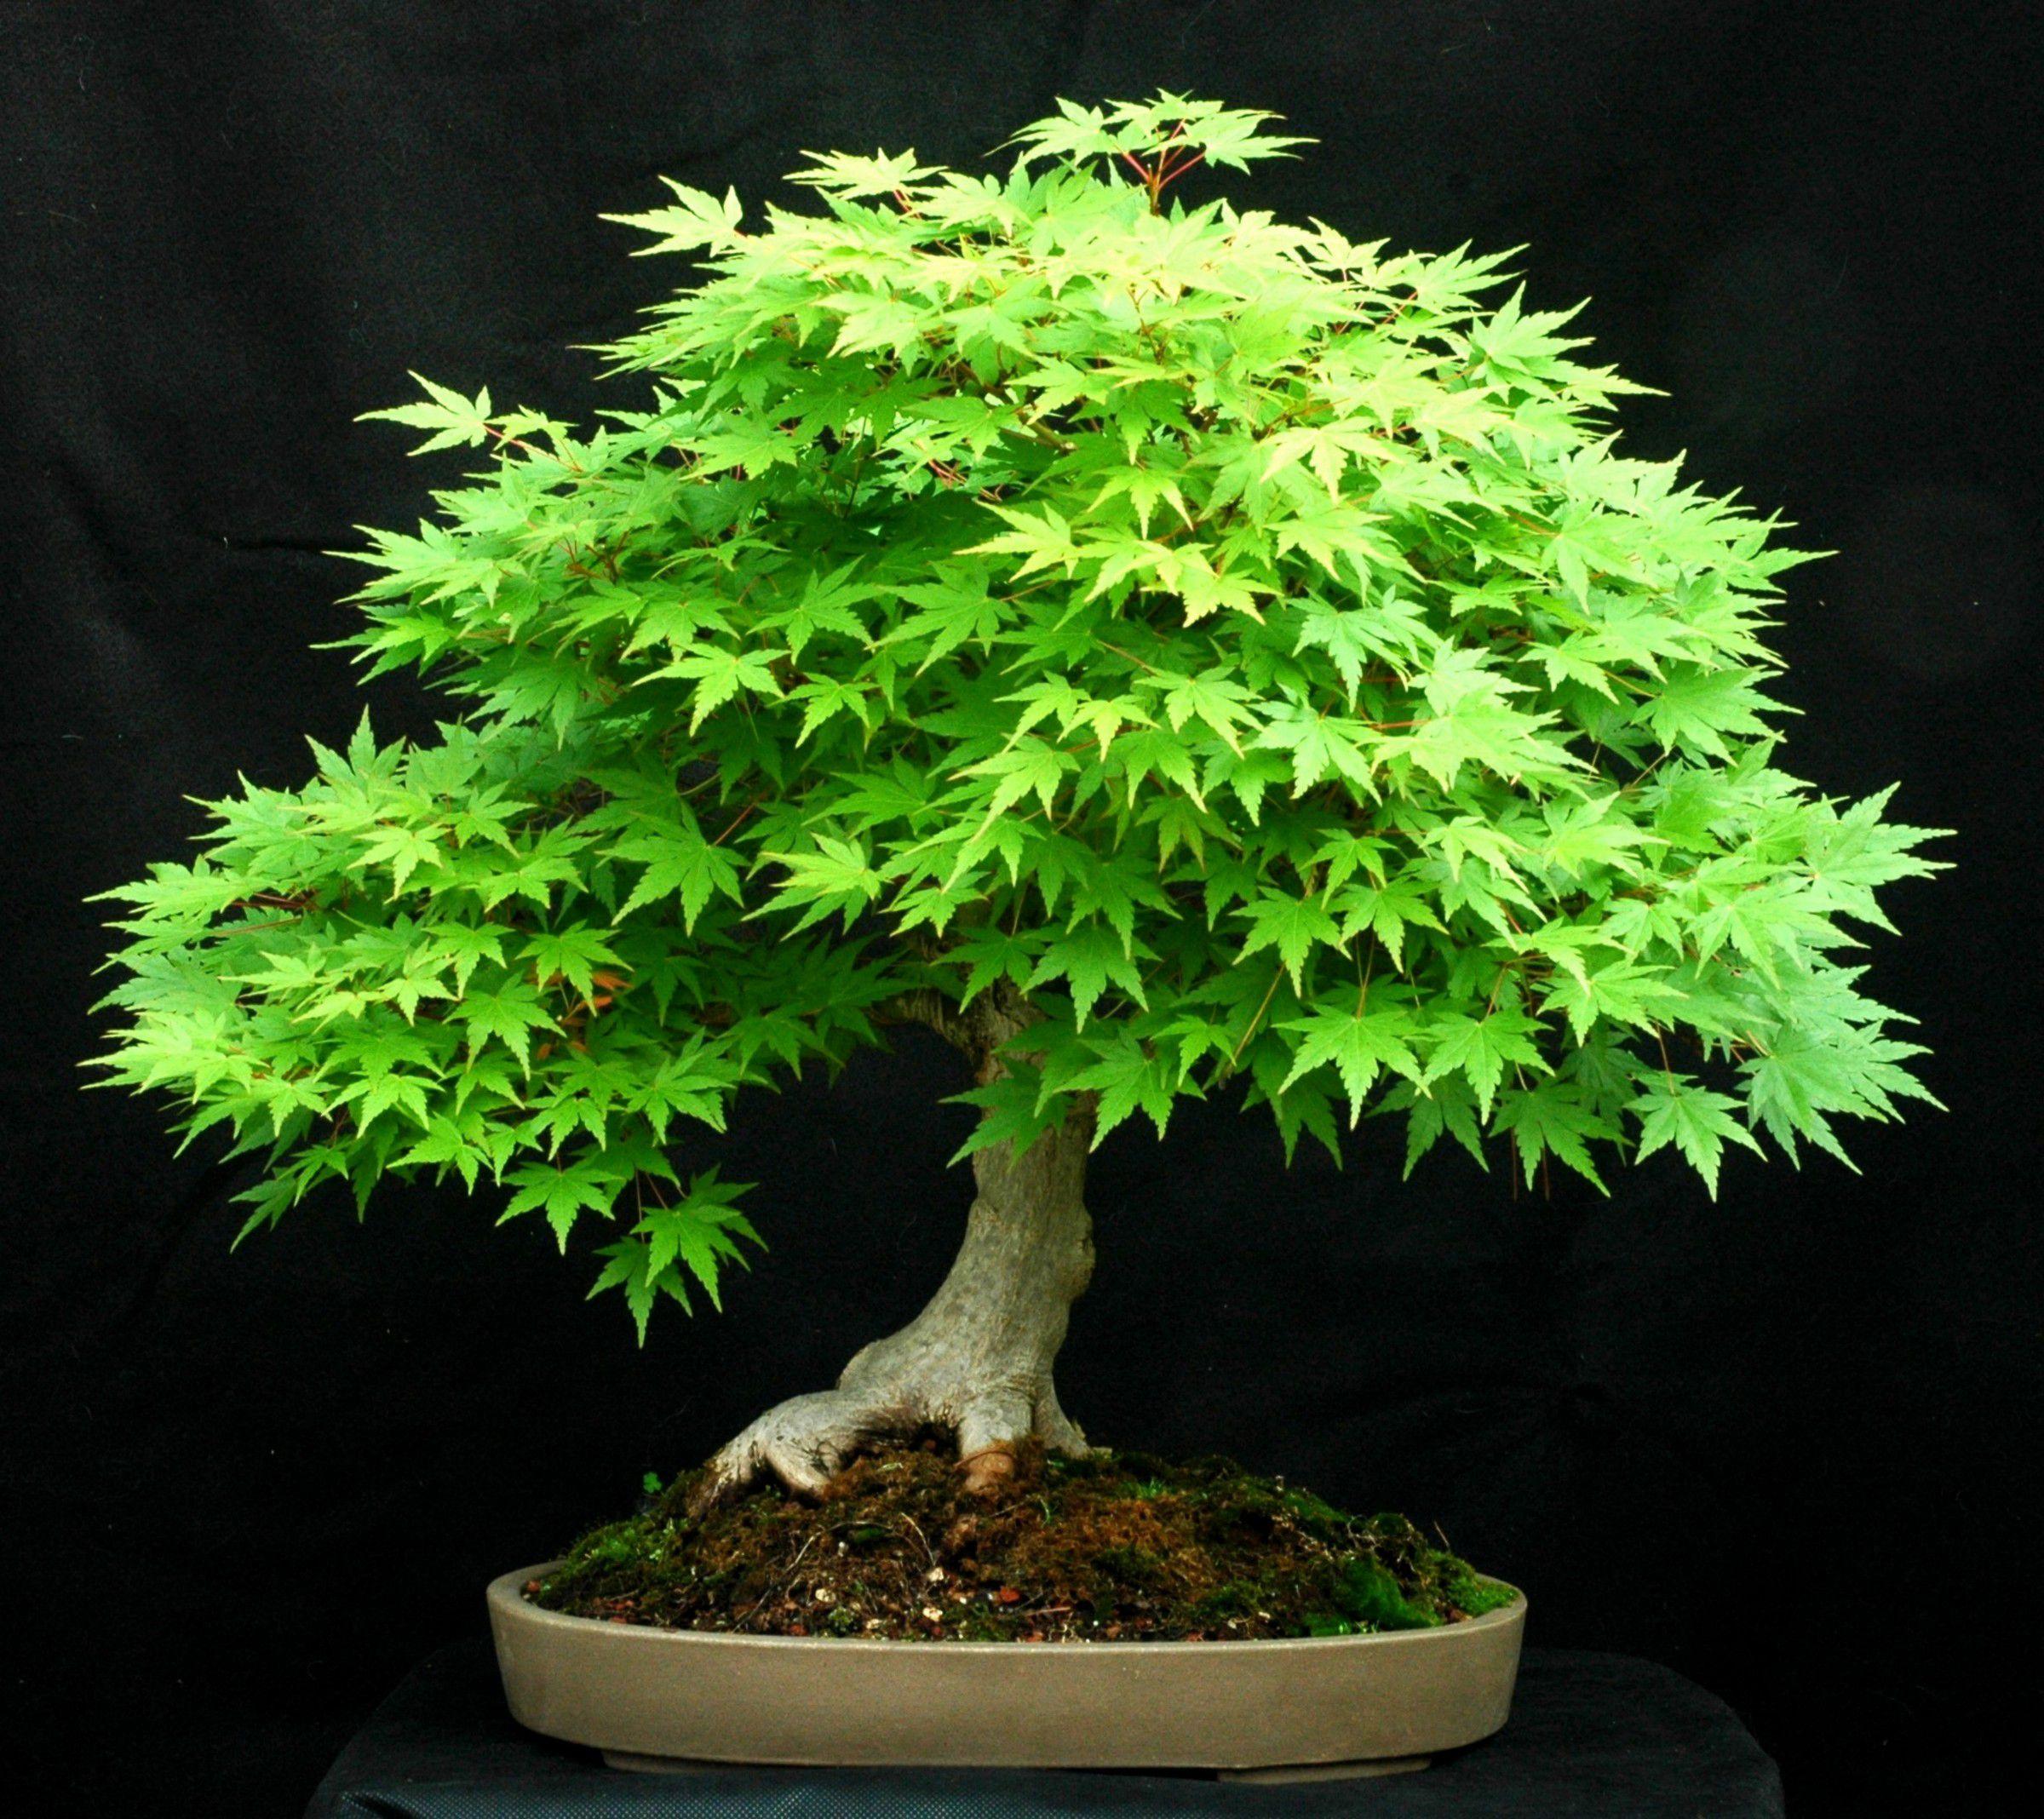 Seeds Japanese Rare Unusual Plant Maple Bonsai Acer Blue Tree Easy Learn Grow up